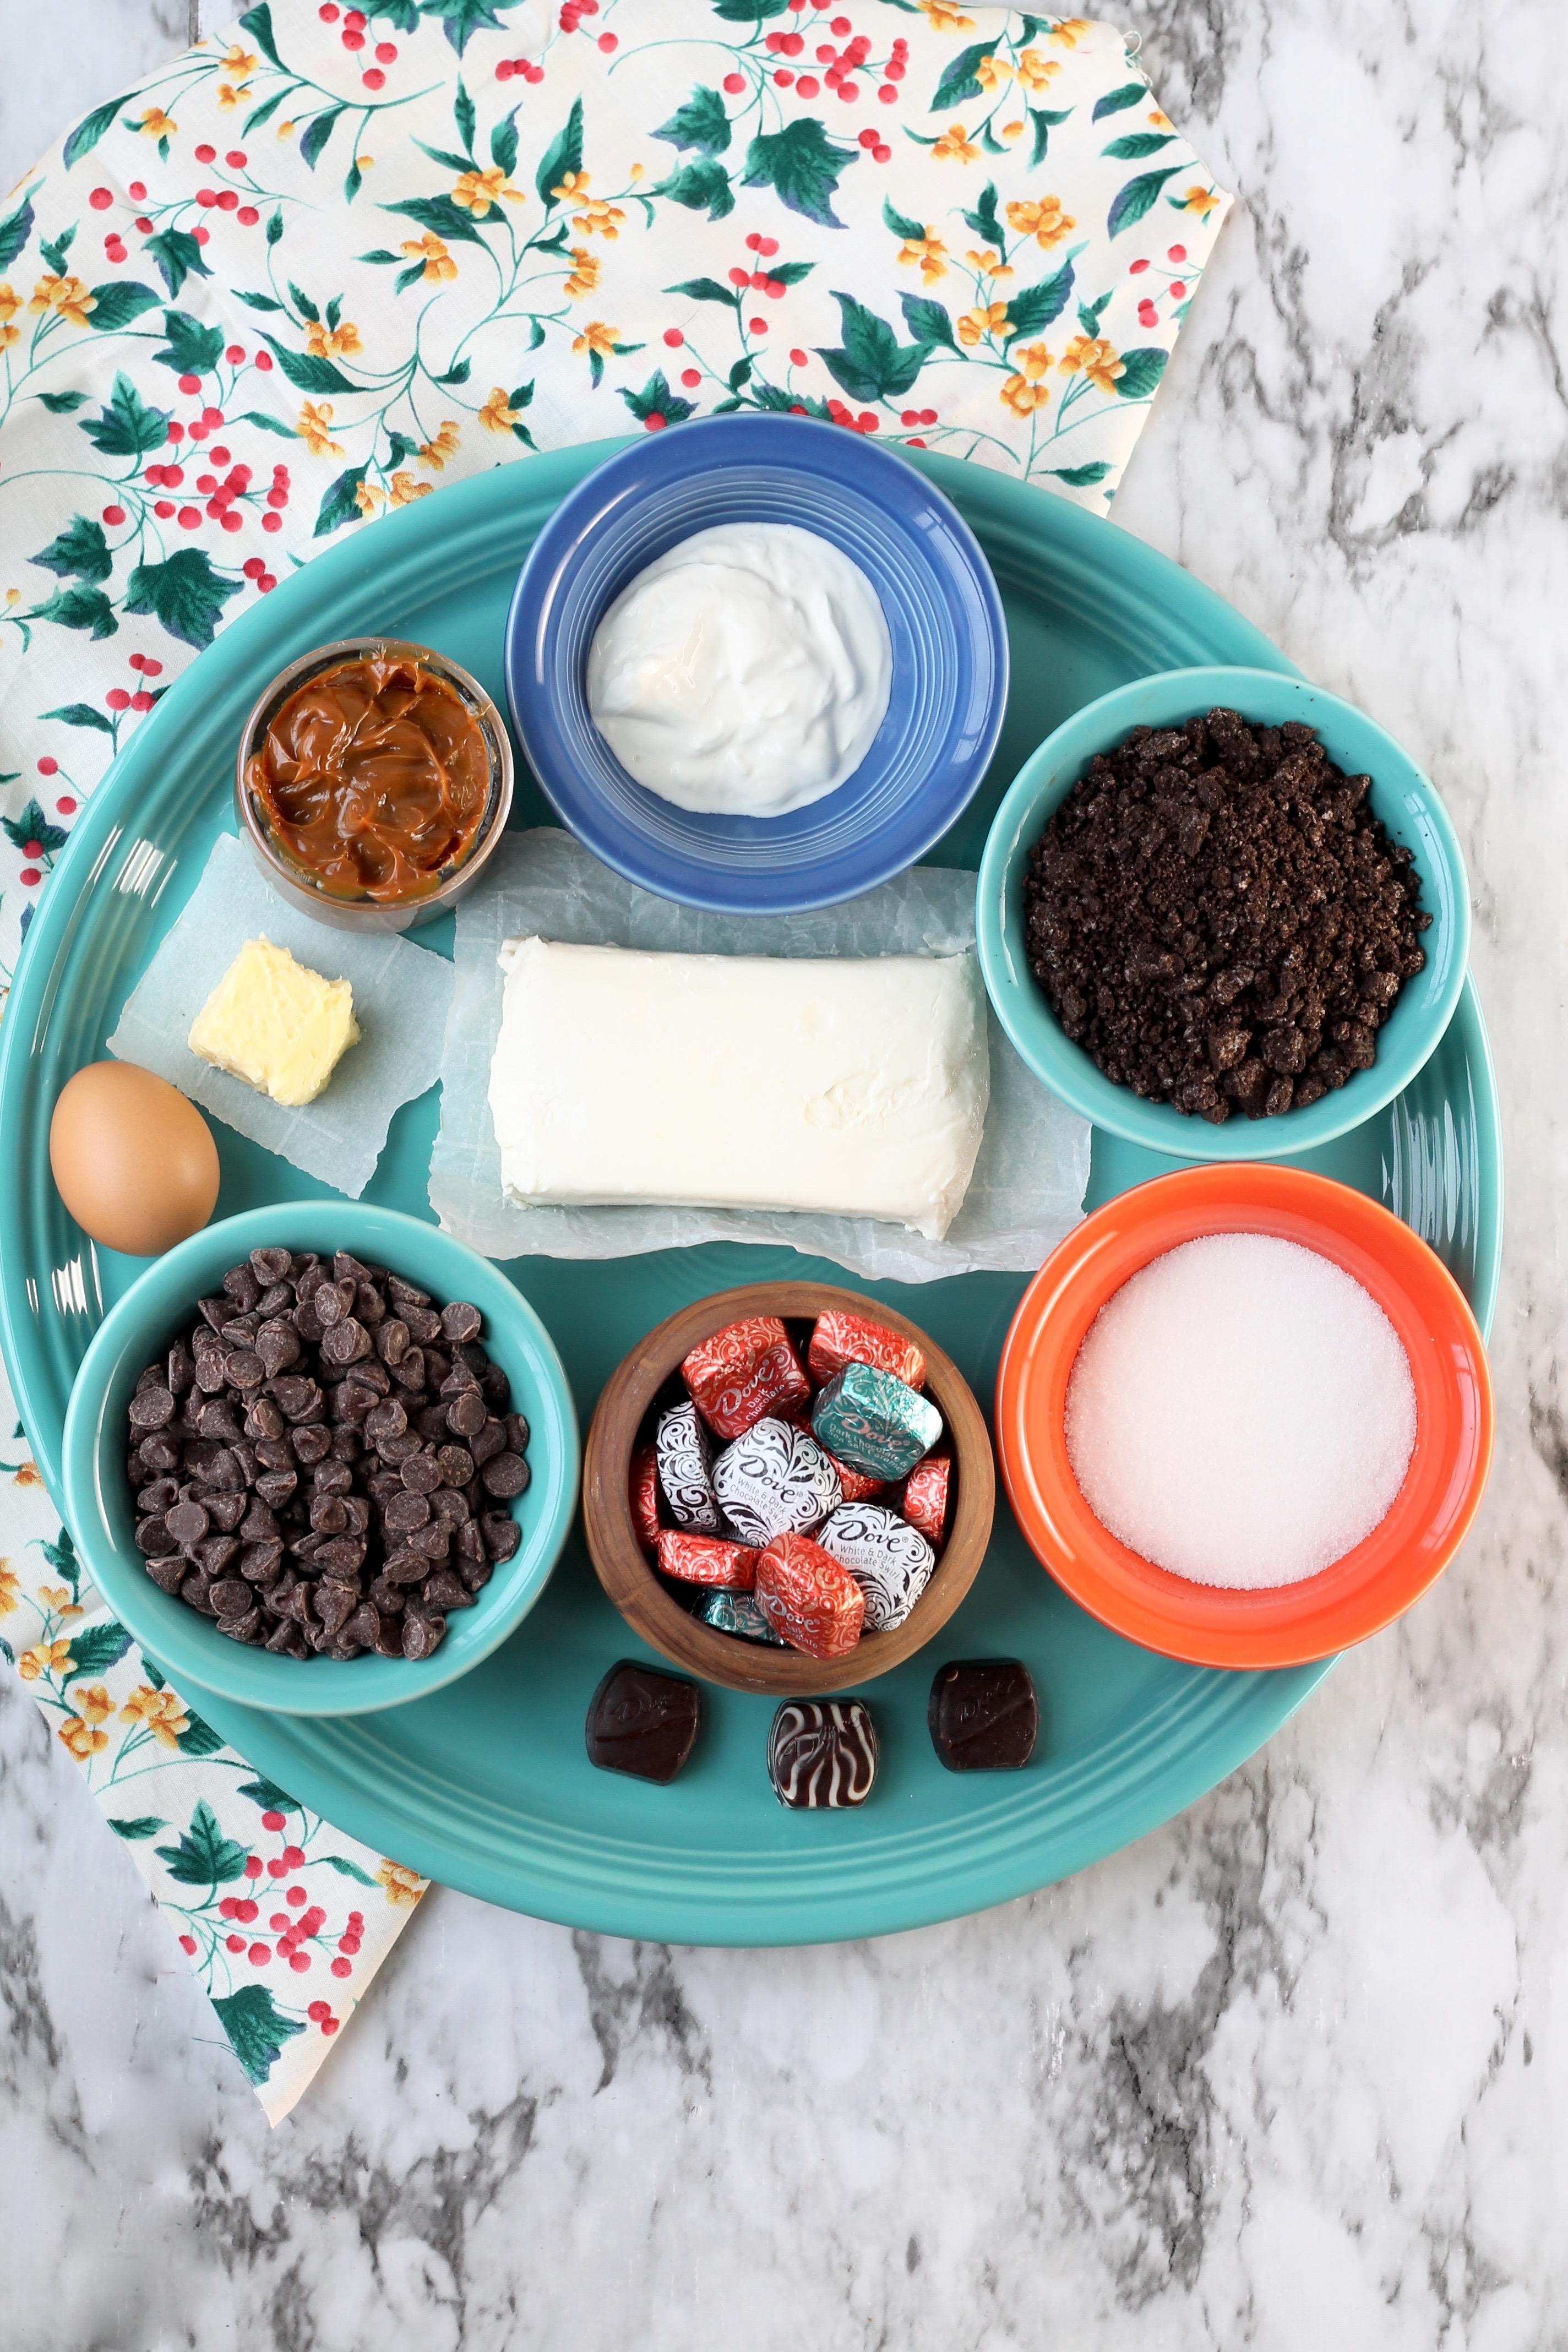 Ingredients for Mini Dove Cheesecakes